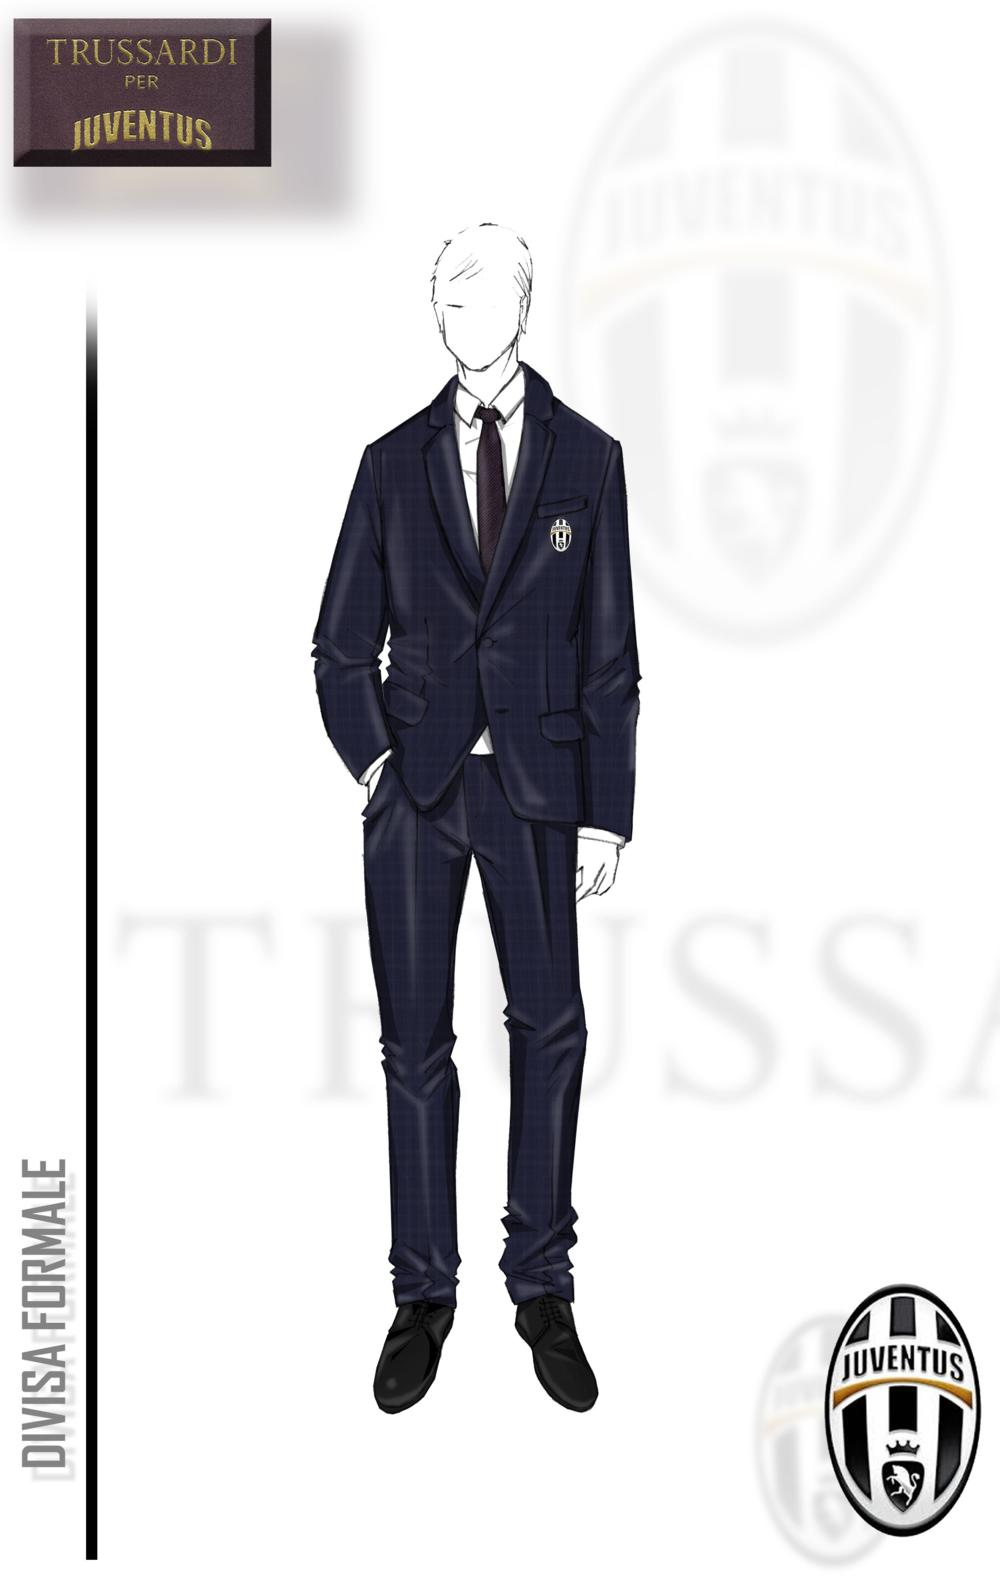 Abito Elegante Juventus.Trussardi Veste La Juventus Di Allegri Fashion Times